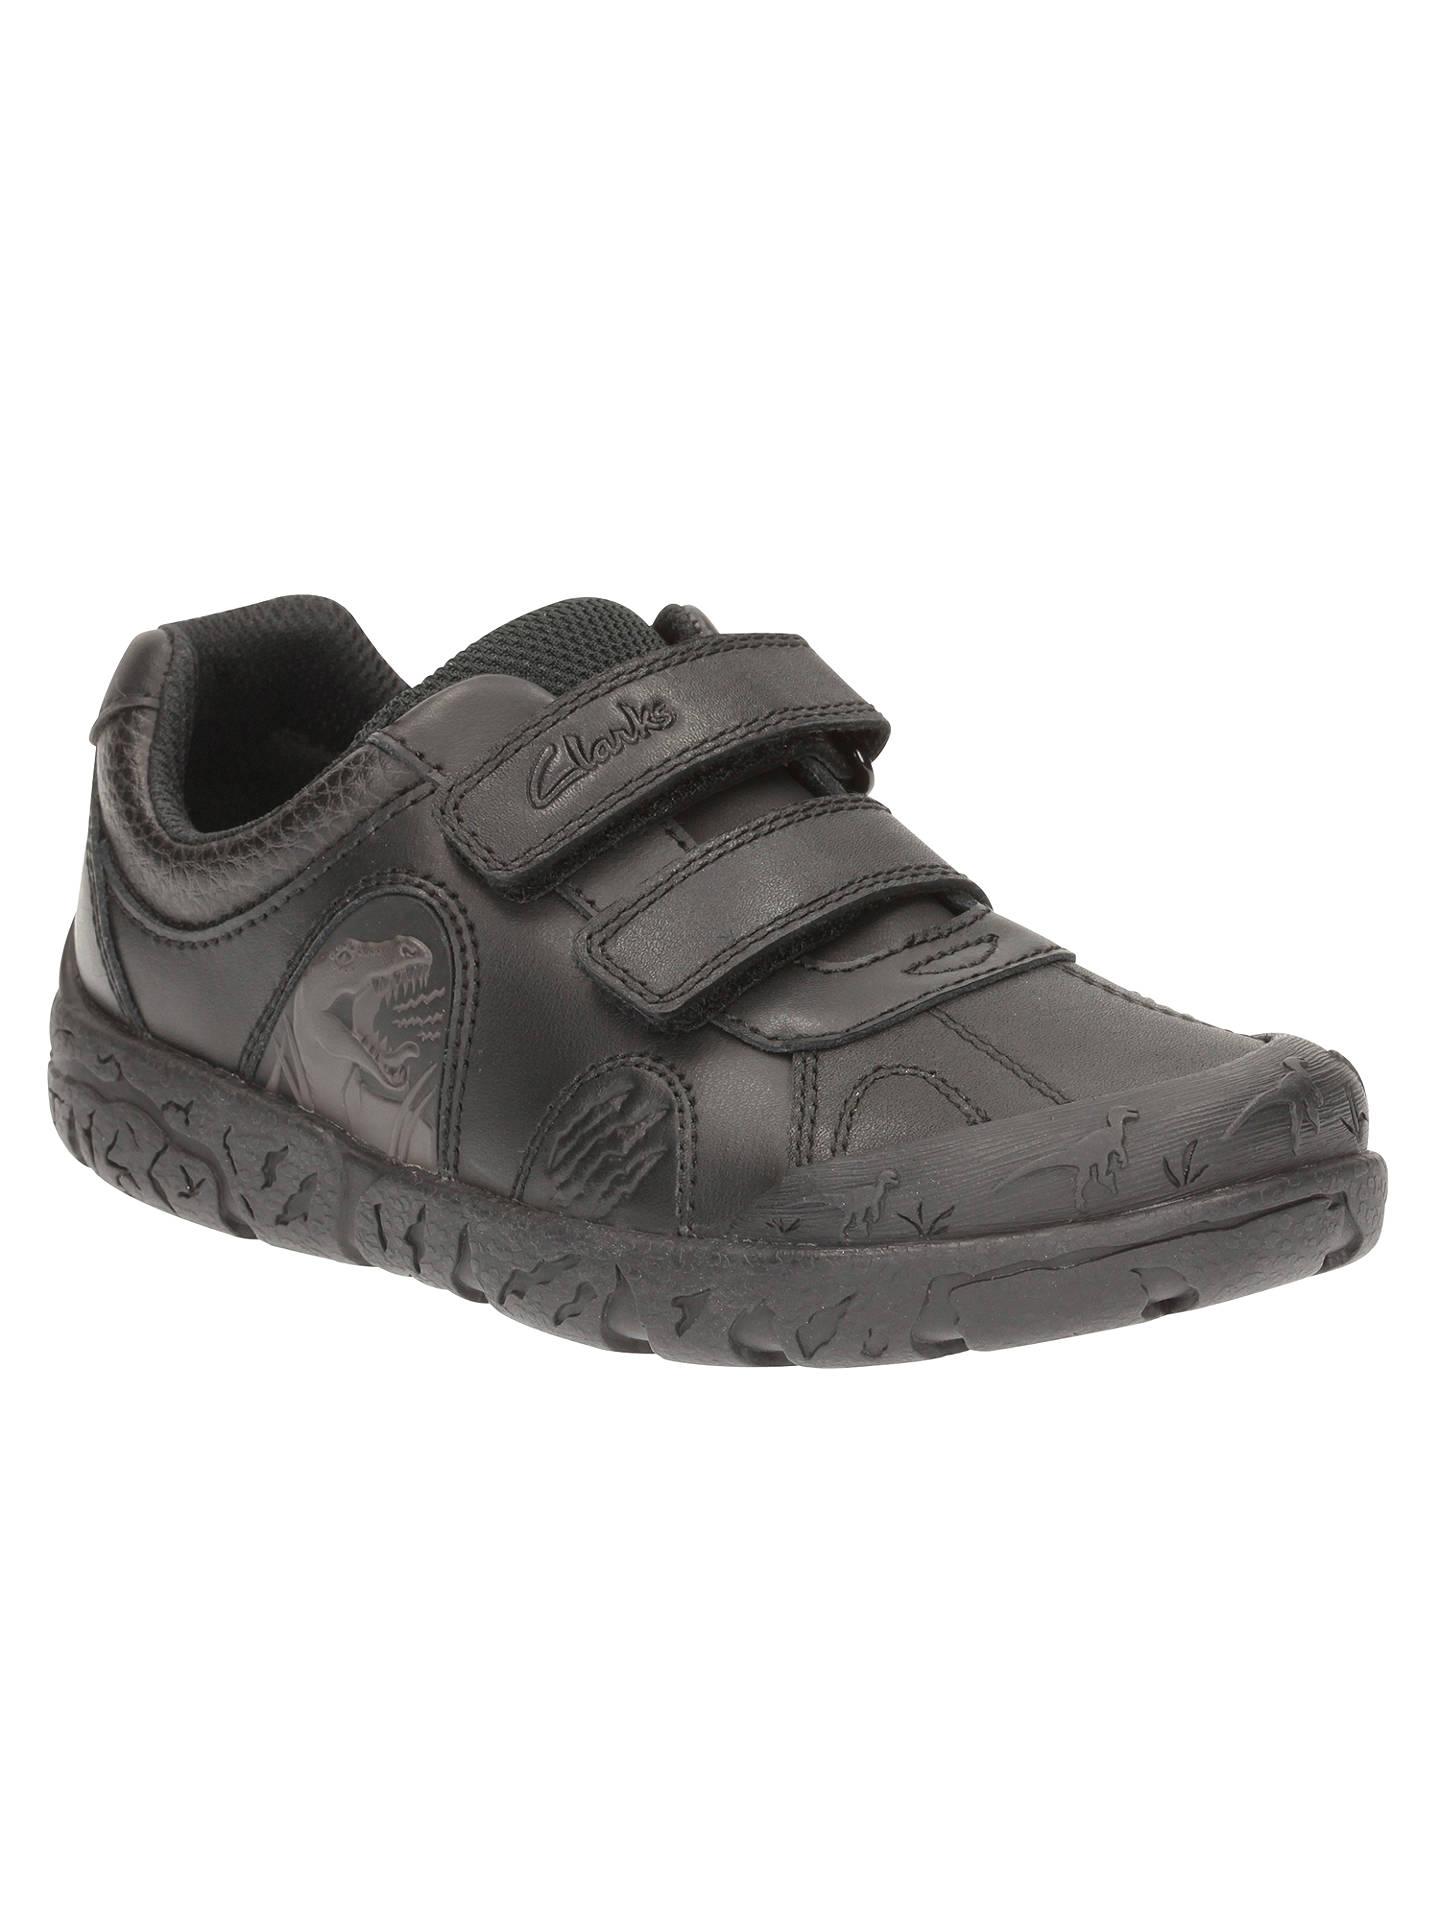 Boys Clarks Dinosaur School Shoes Bronto Step